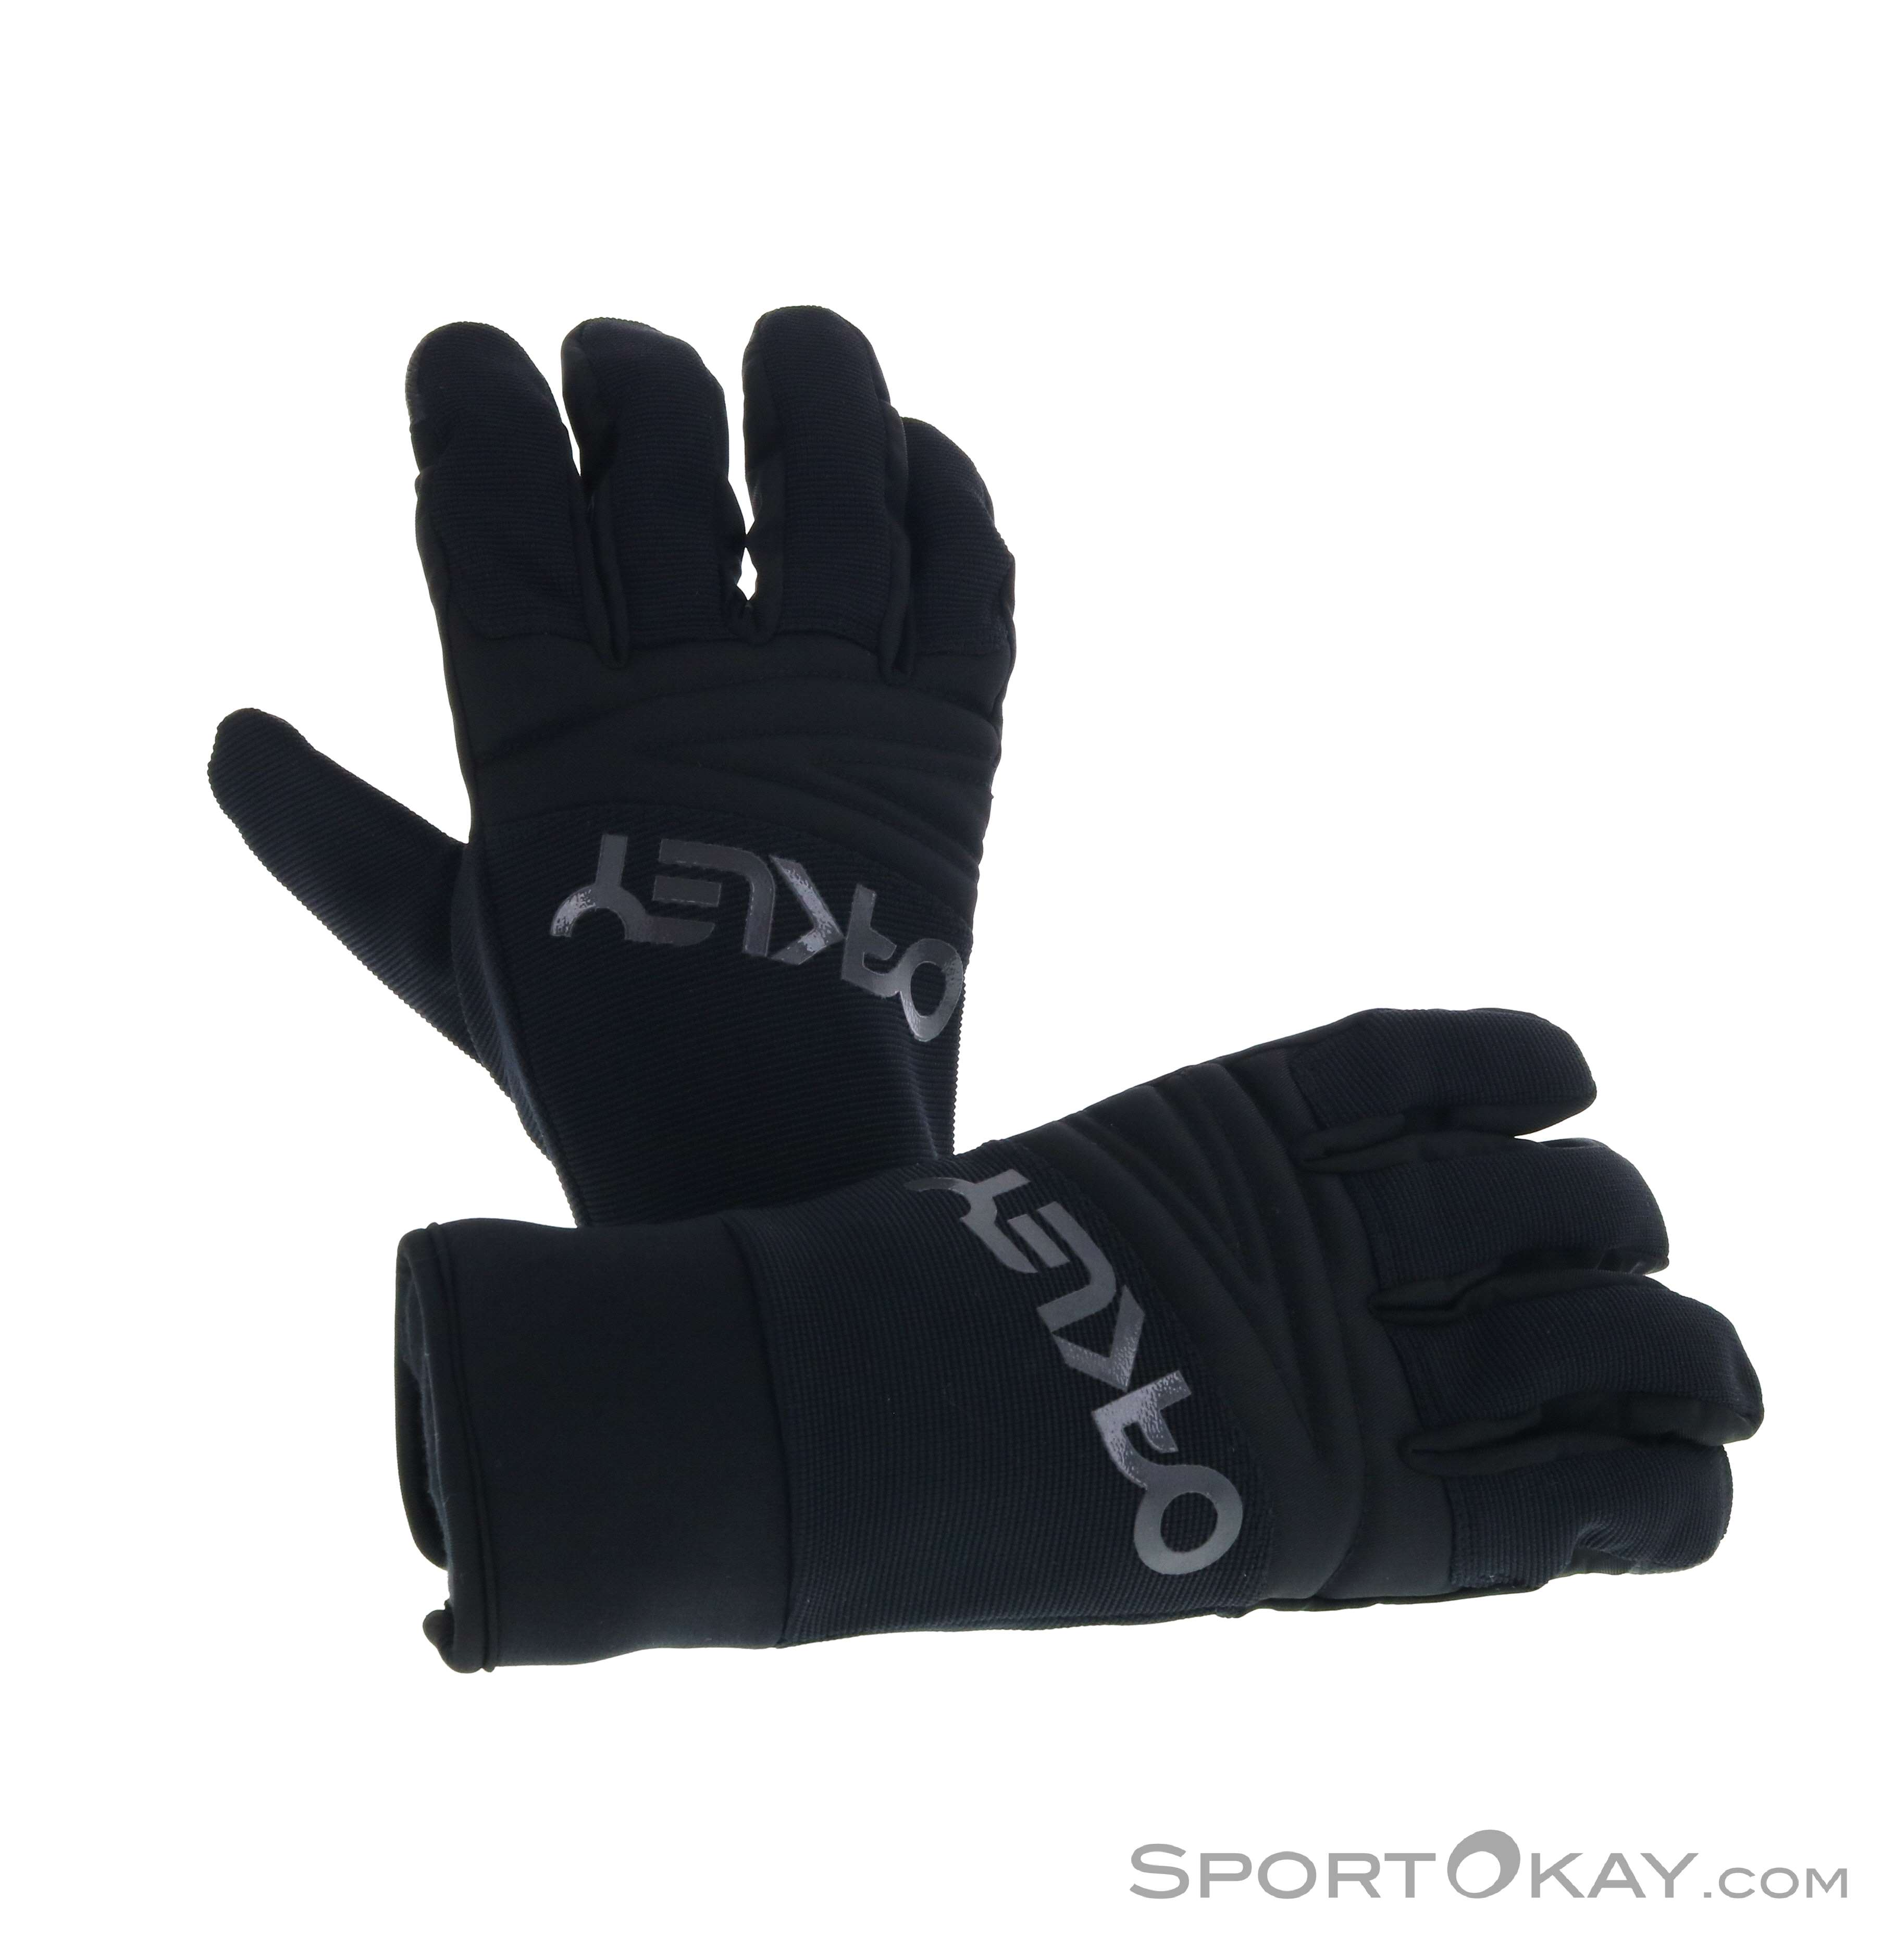 Oakley Factory Park Glove Handschuhe-Schwarz-M